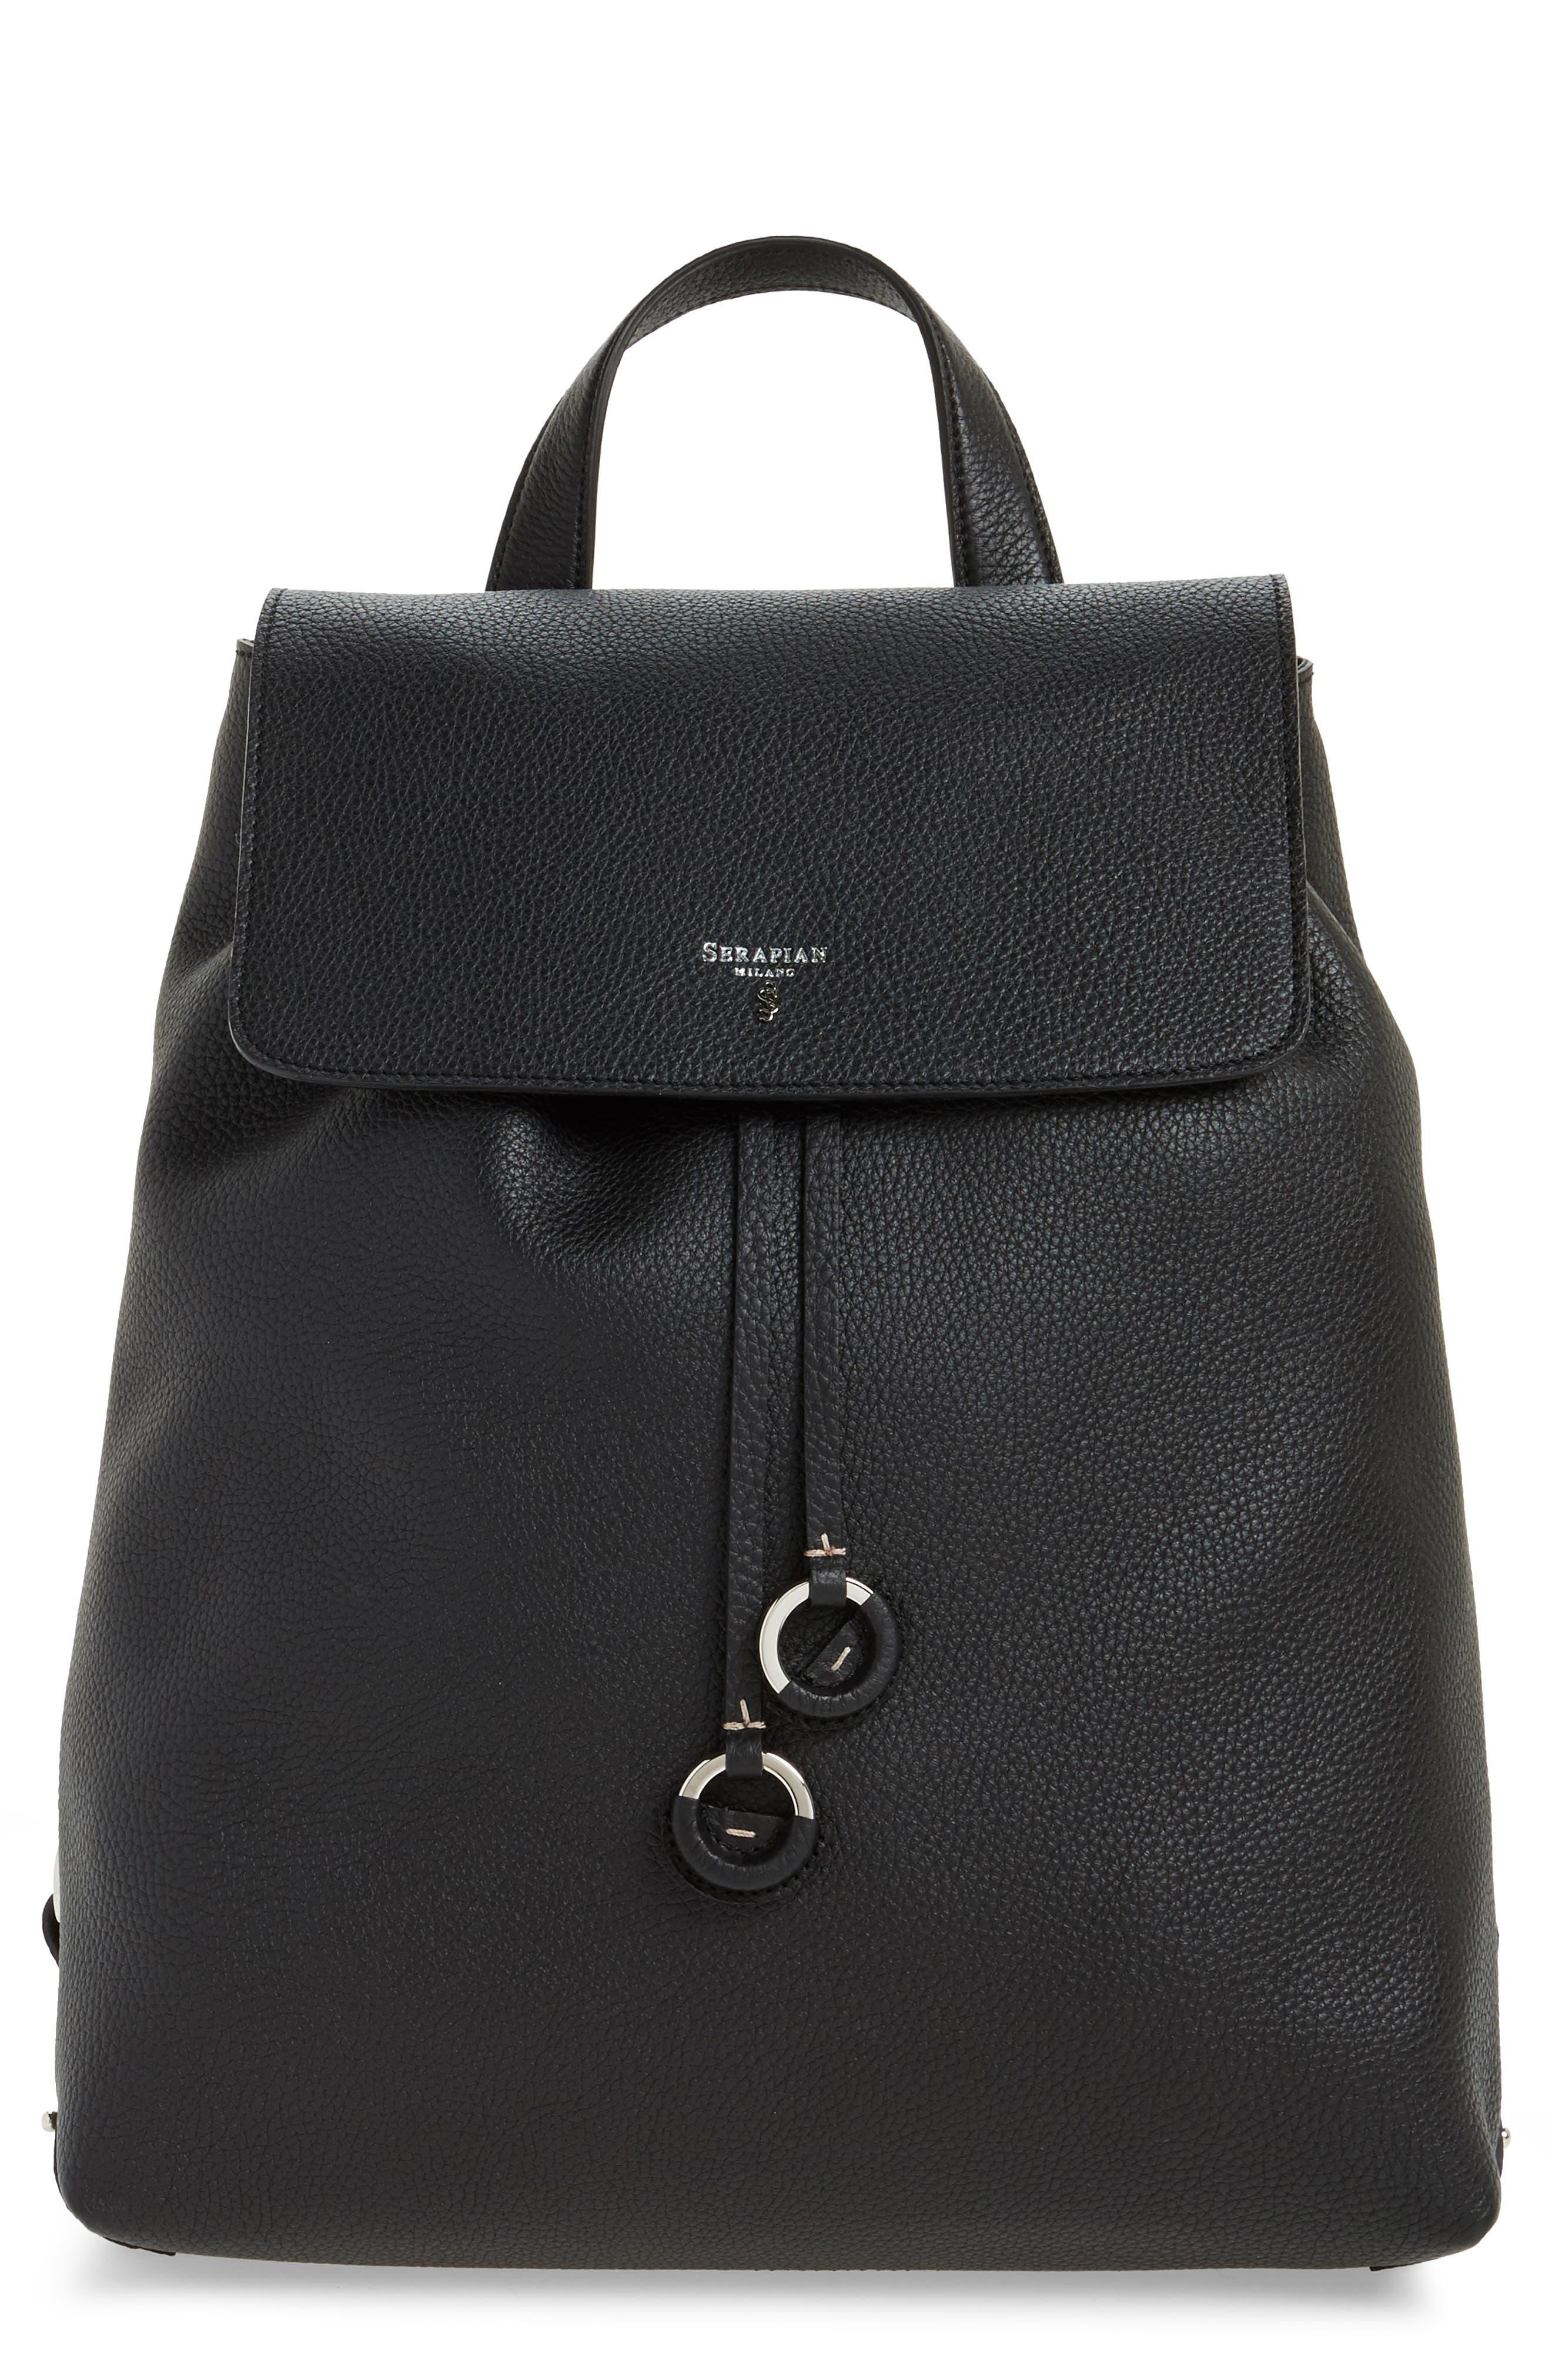 Serapian Milano Carmen Cachemire Leather Backpack